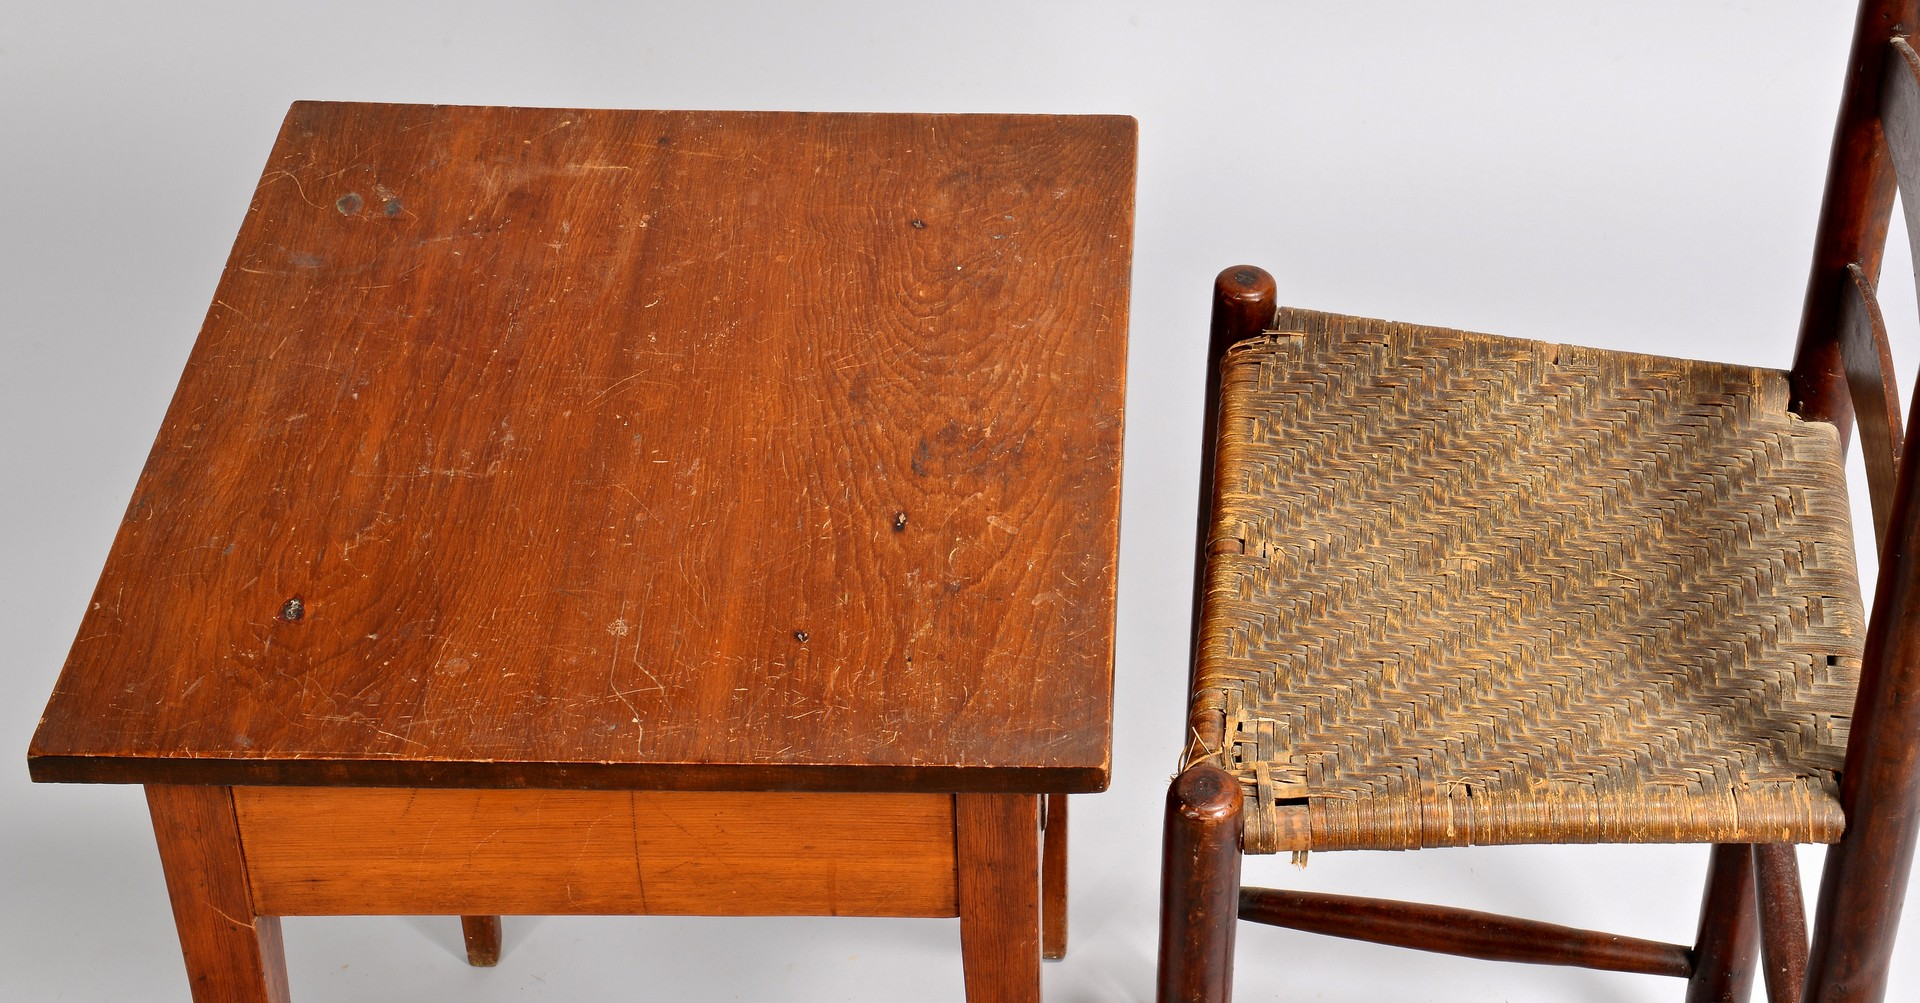 Lot 699: East TN Weaver Chair & Hepplewhite Table